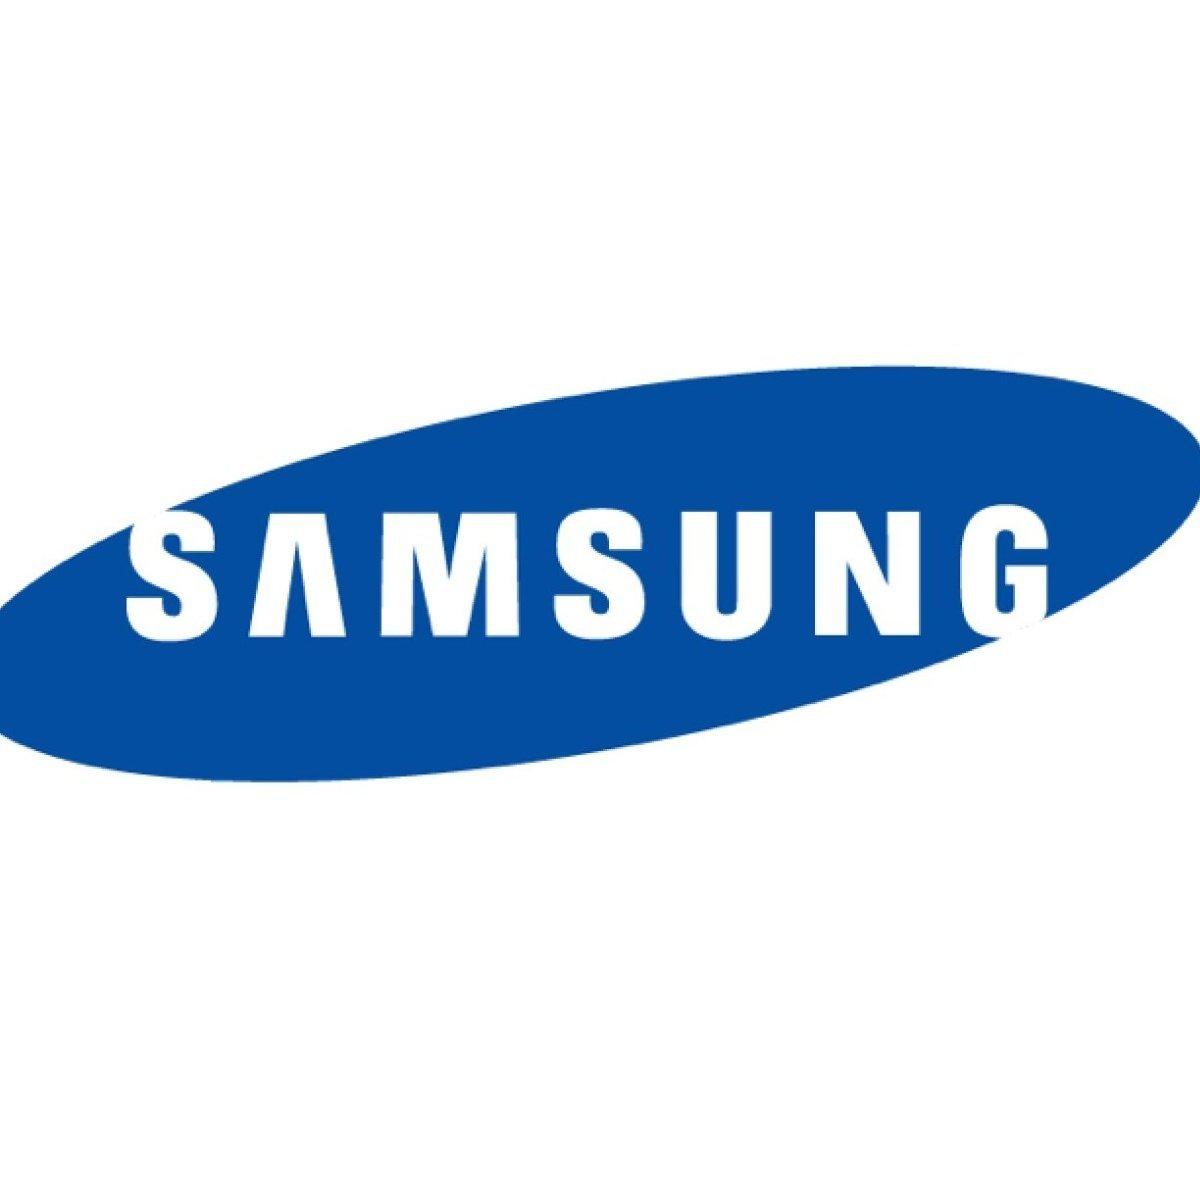 logo-samsung-carré.jpg_cropped_0x0_cropped_0x0